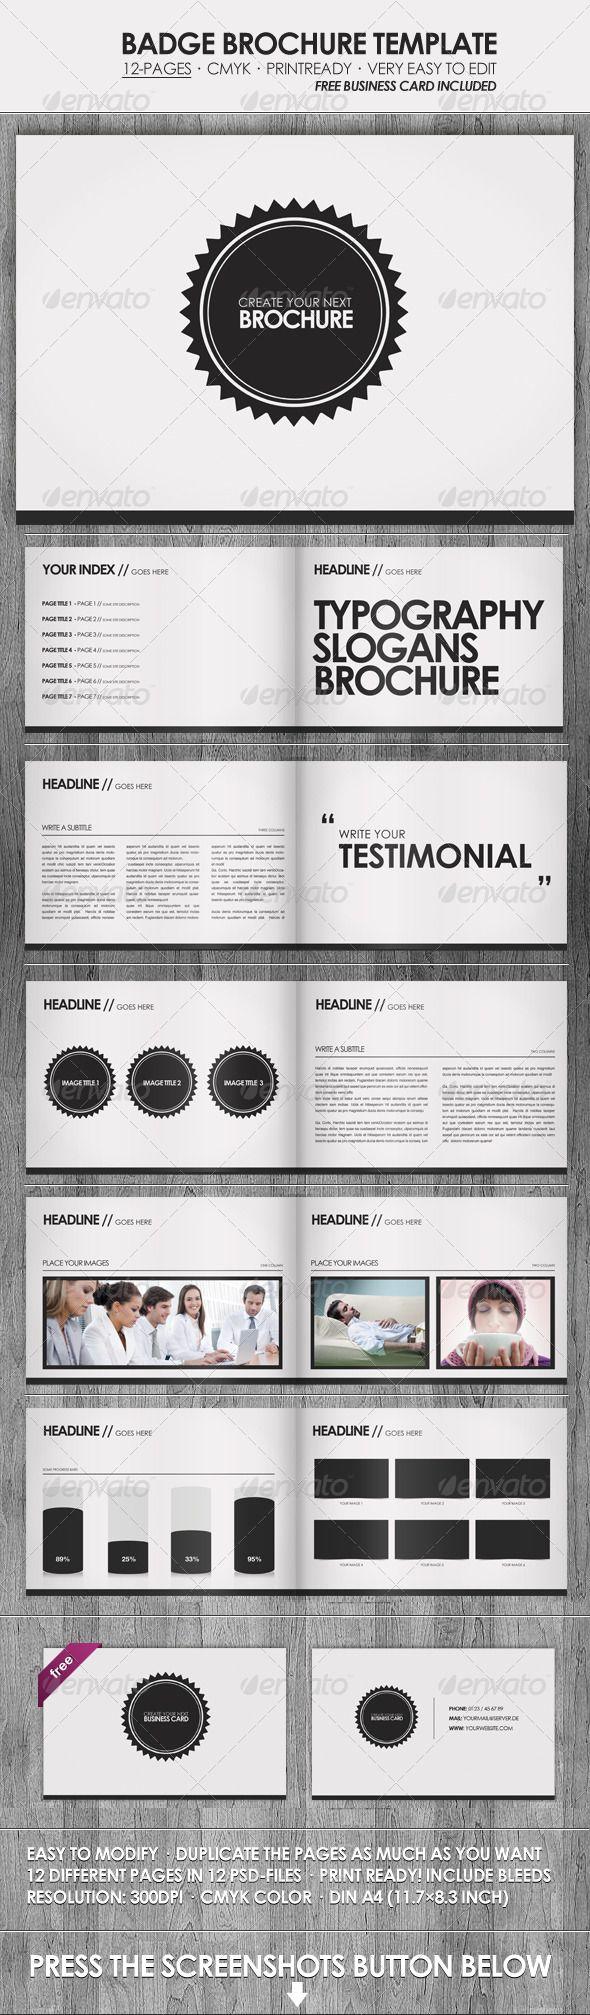 Badge - Brochure / Presentation Template - GraphicRiver Item for Sale